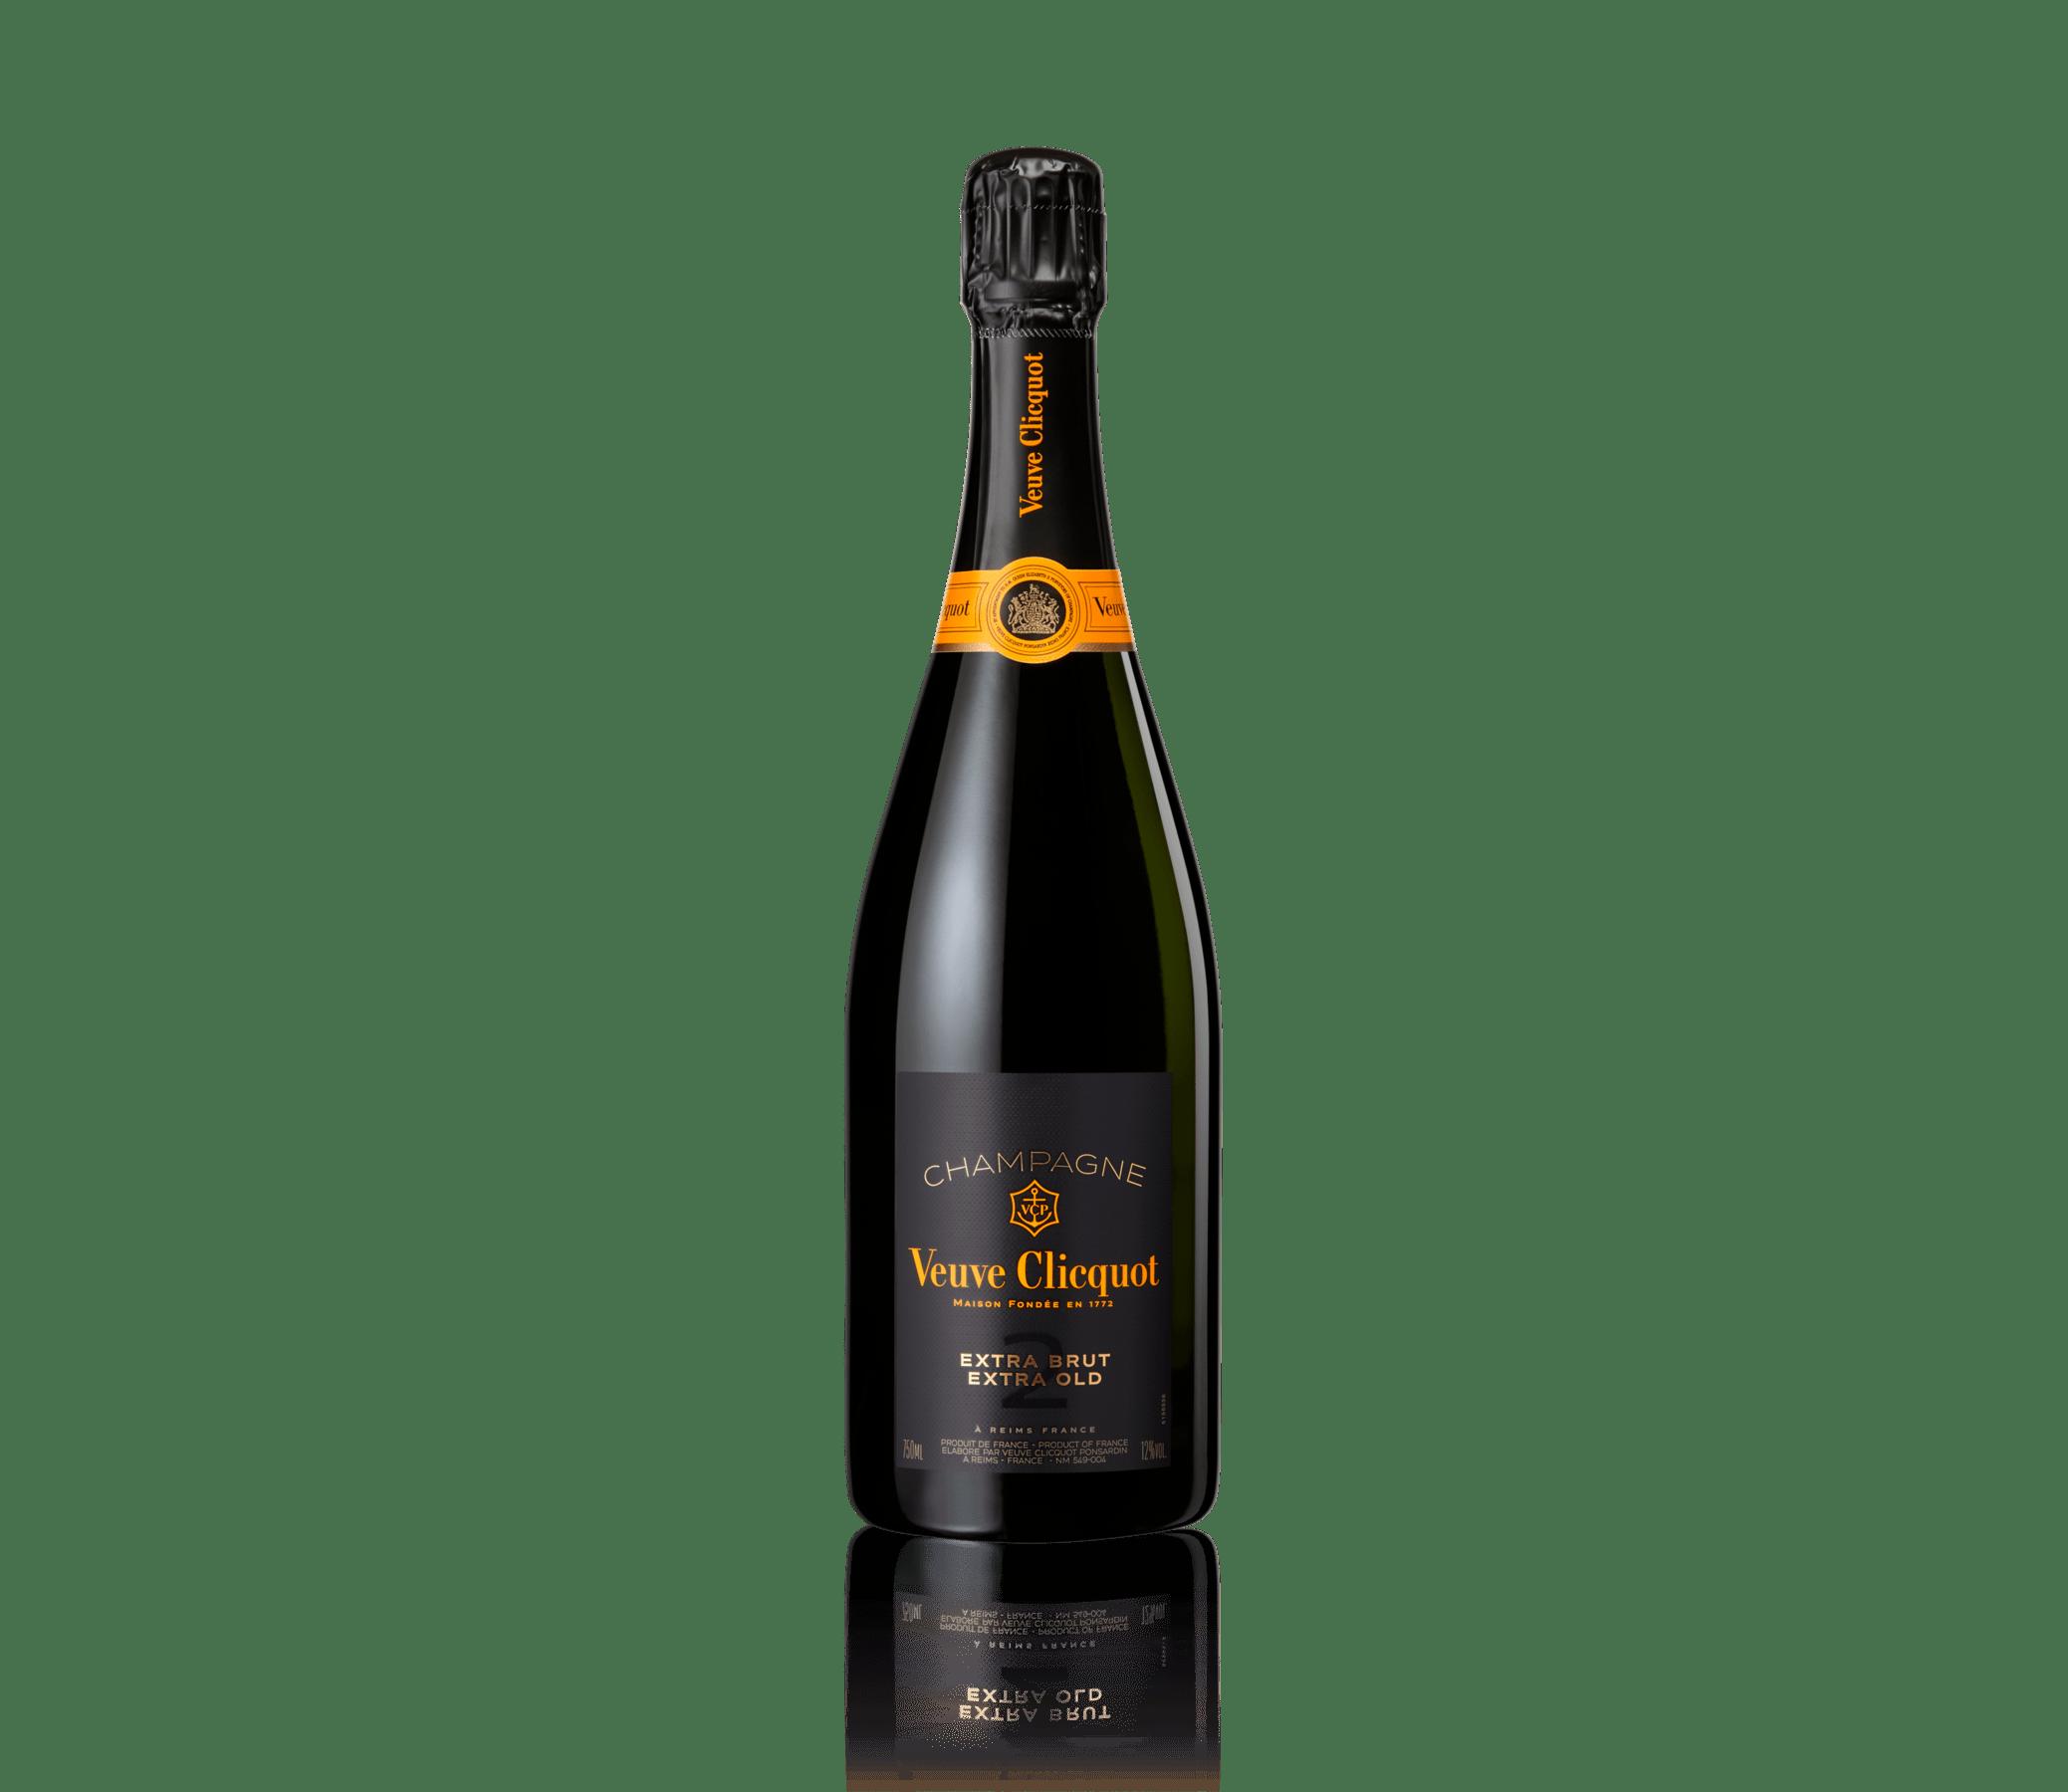 Garrafa do Champagne Veuve Clicquot Extra Brut Extra Old 2